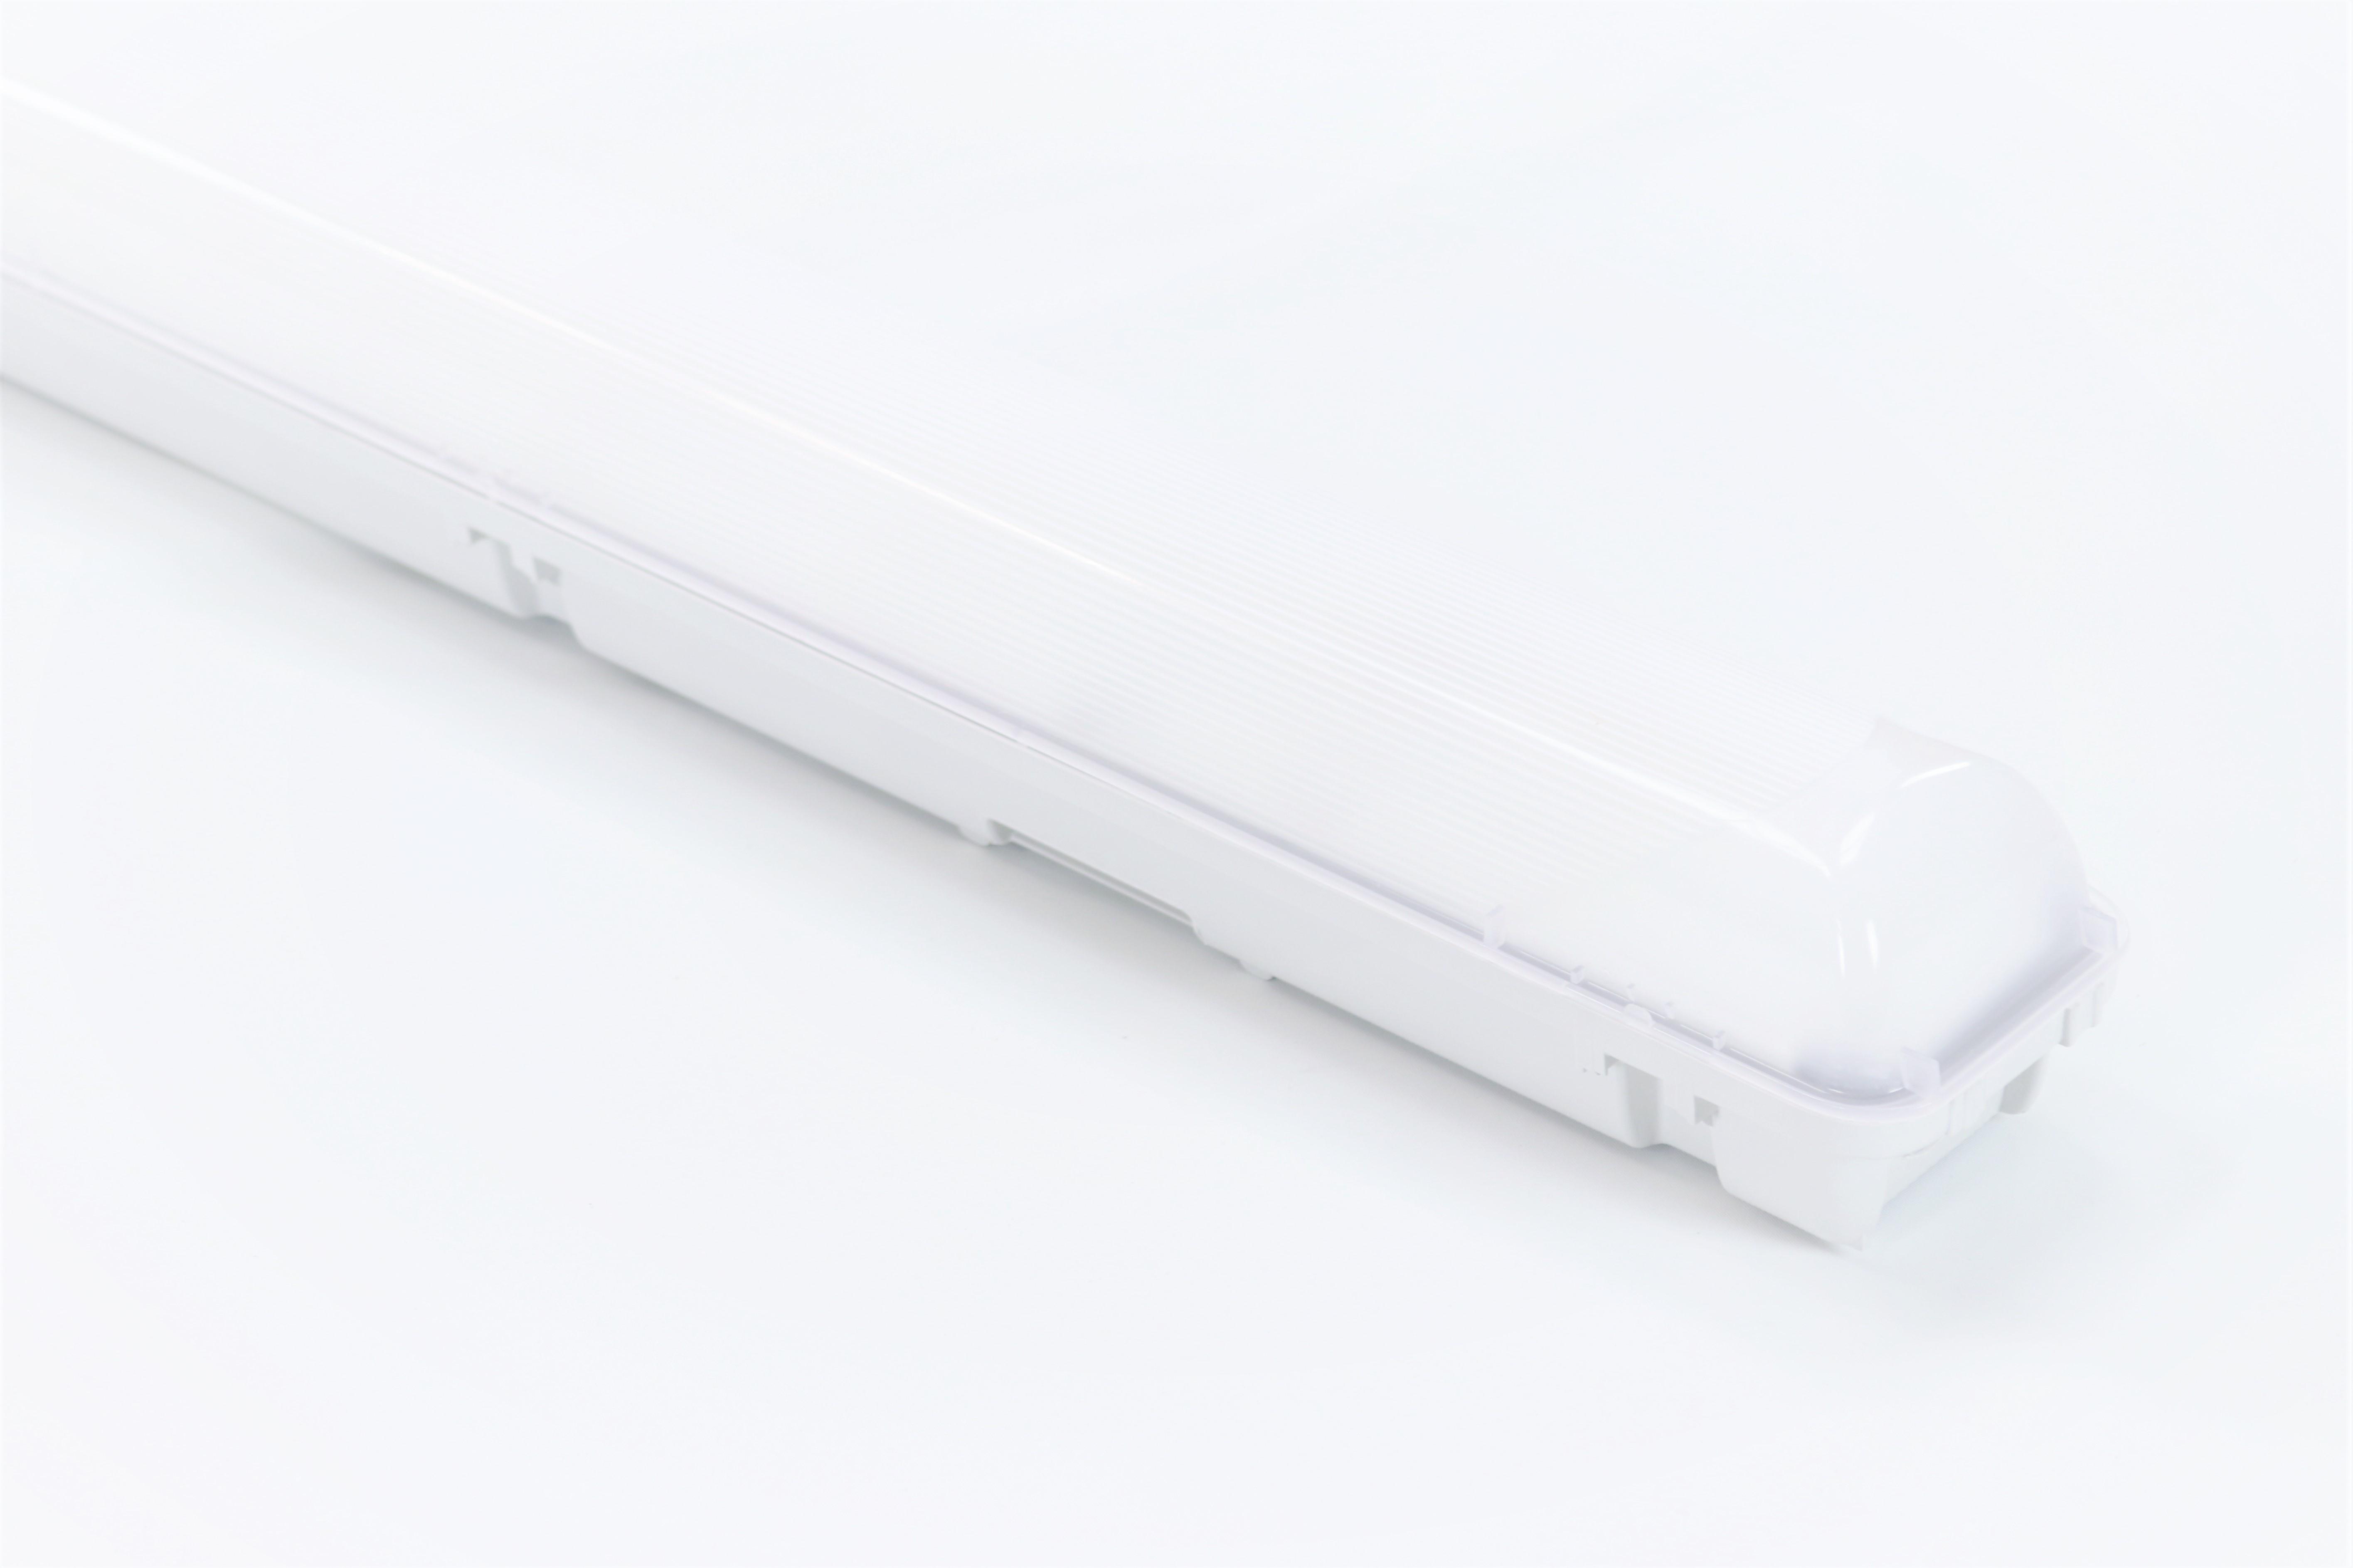 ZALUX LED-Feuchtraumleuchte Oleveon 1500 LED6000-865 ET PMMA